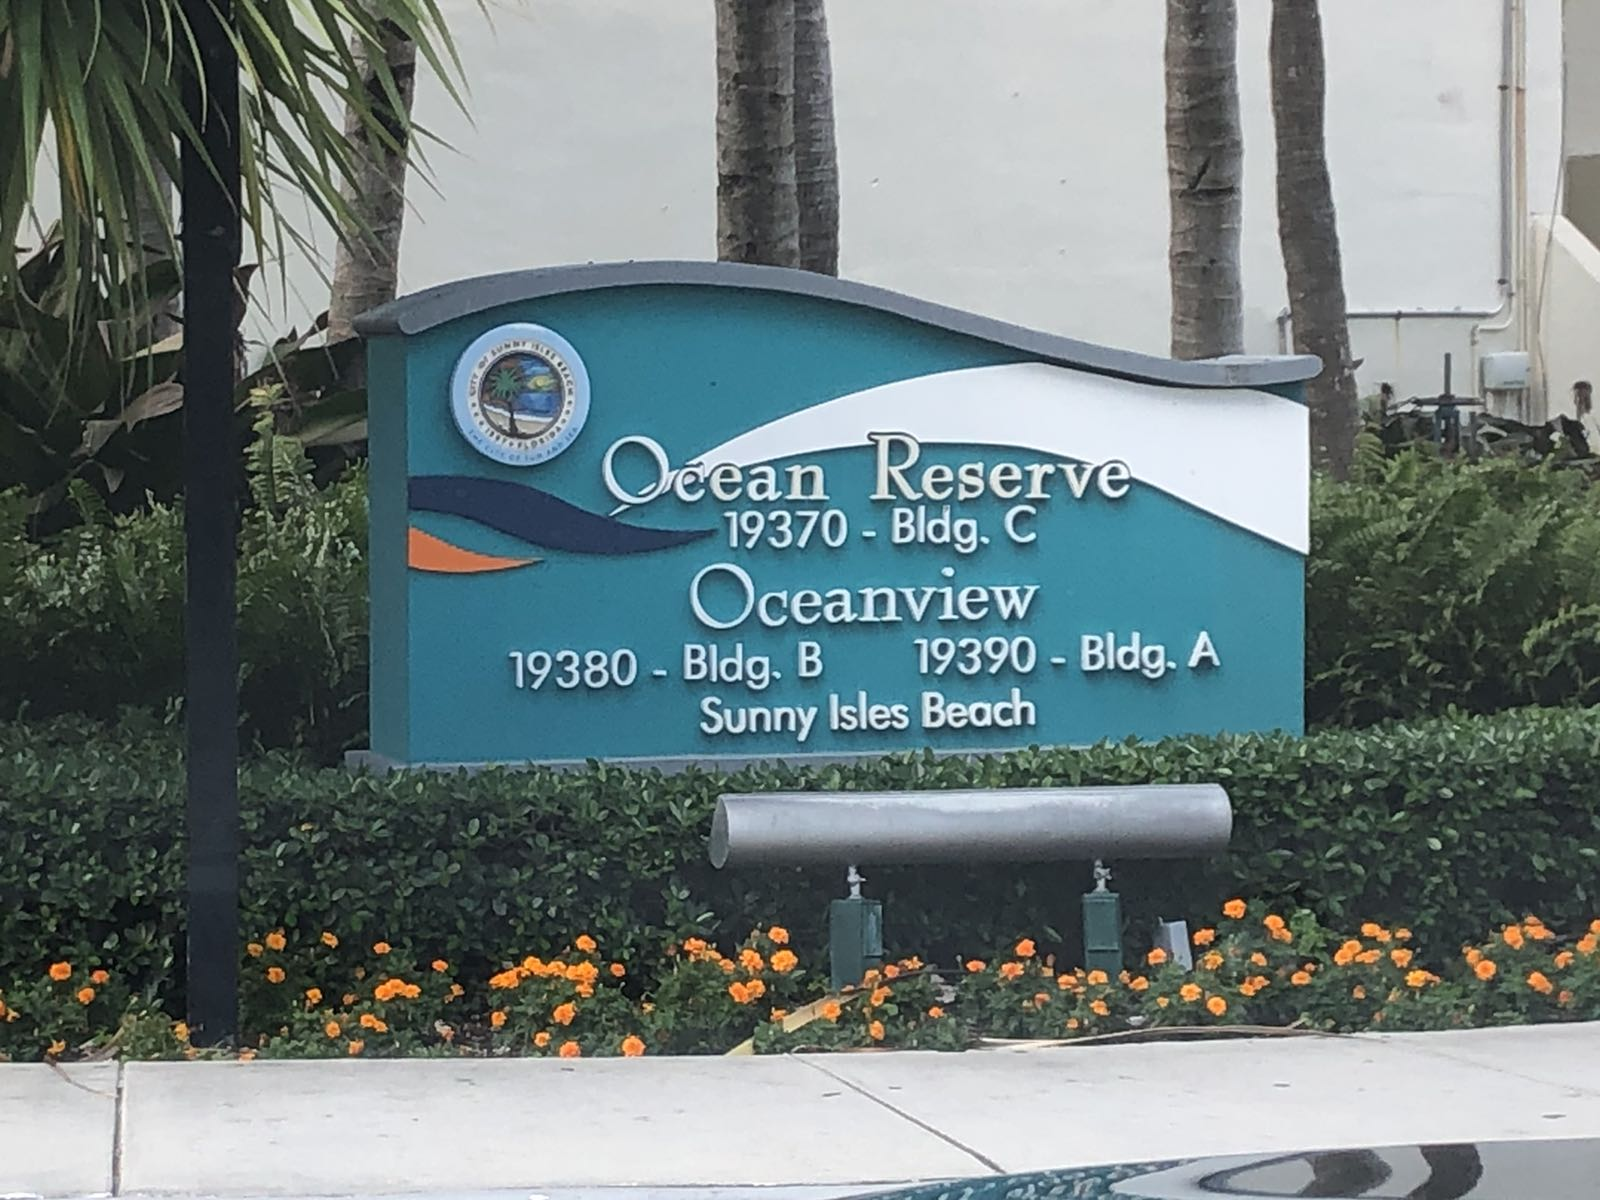 Ocean Reserve - Image 2